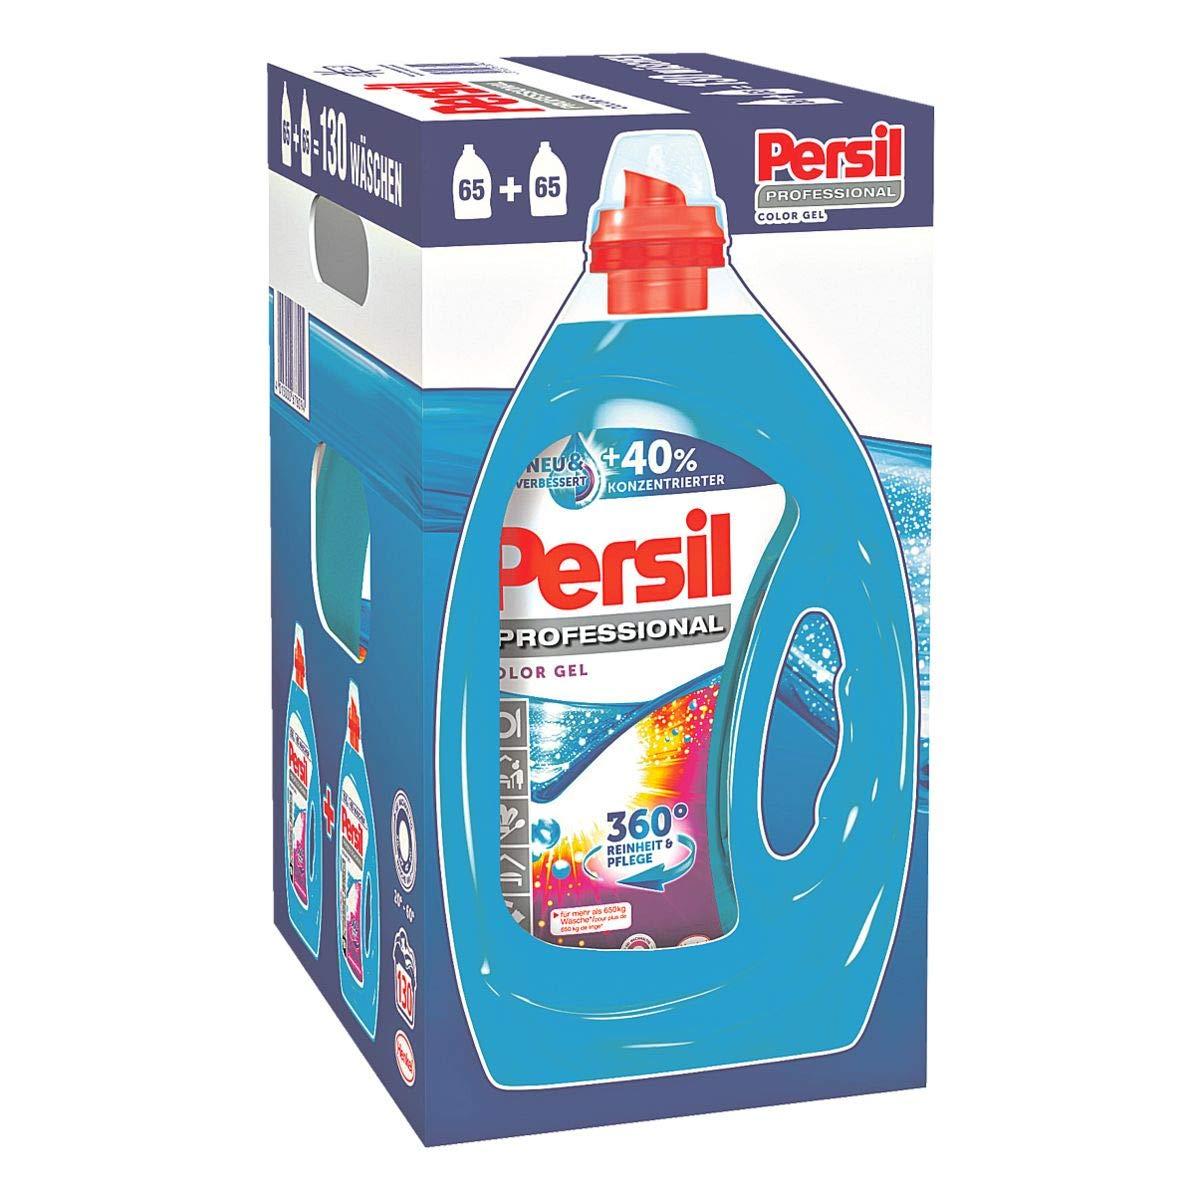 Persil Professional Color Gel 2 x 65 WL, 6.5ltr